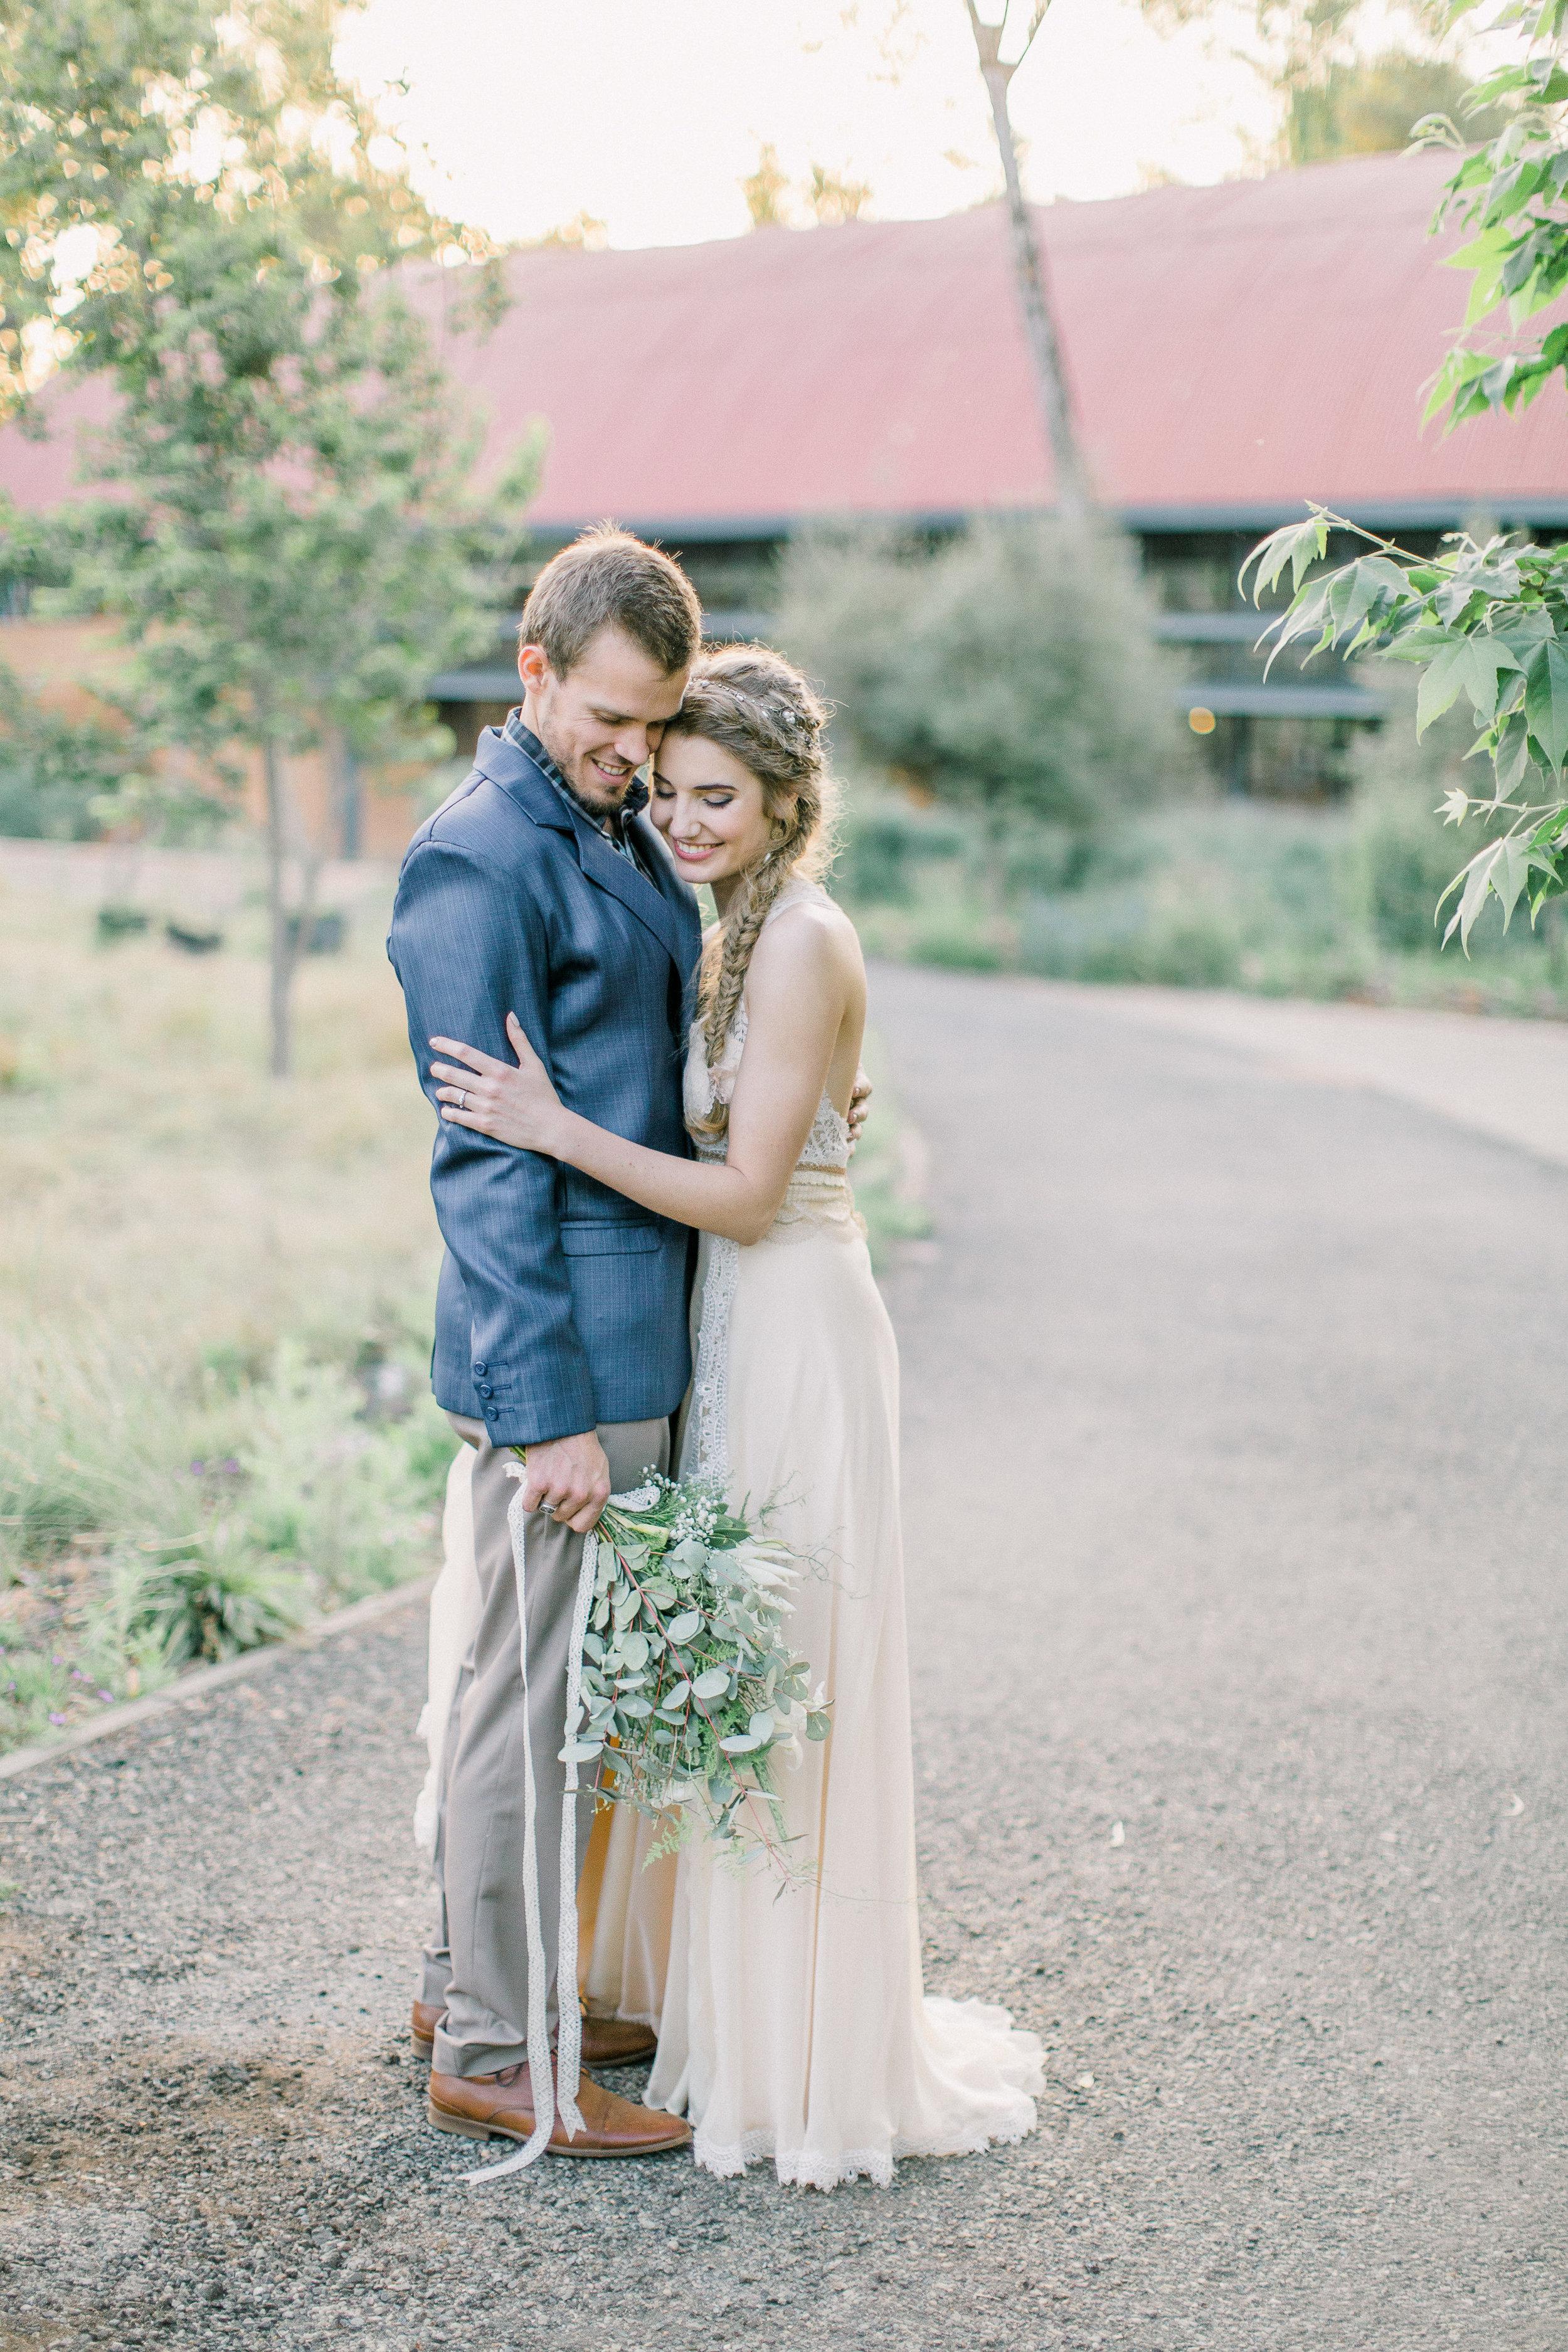 clareece smit south africa vintage boho wedding44.jpg